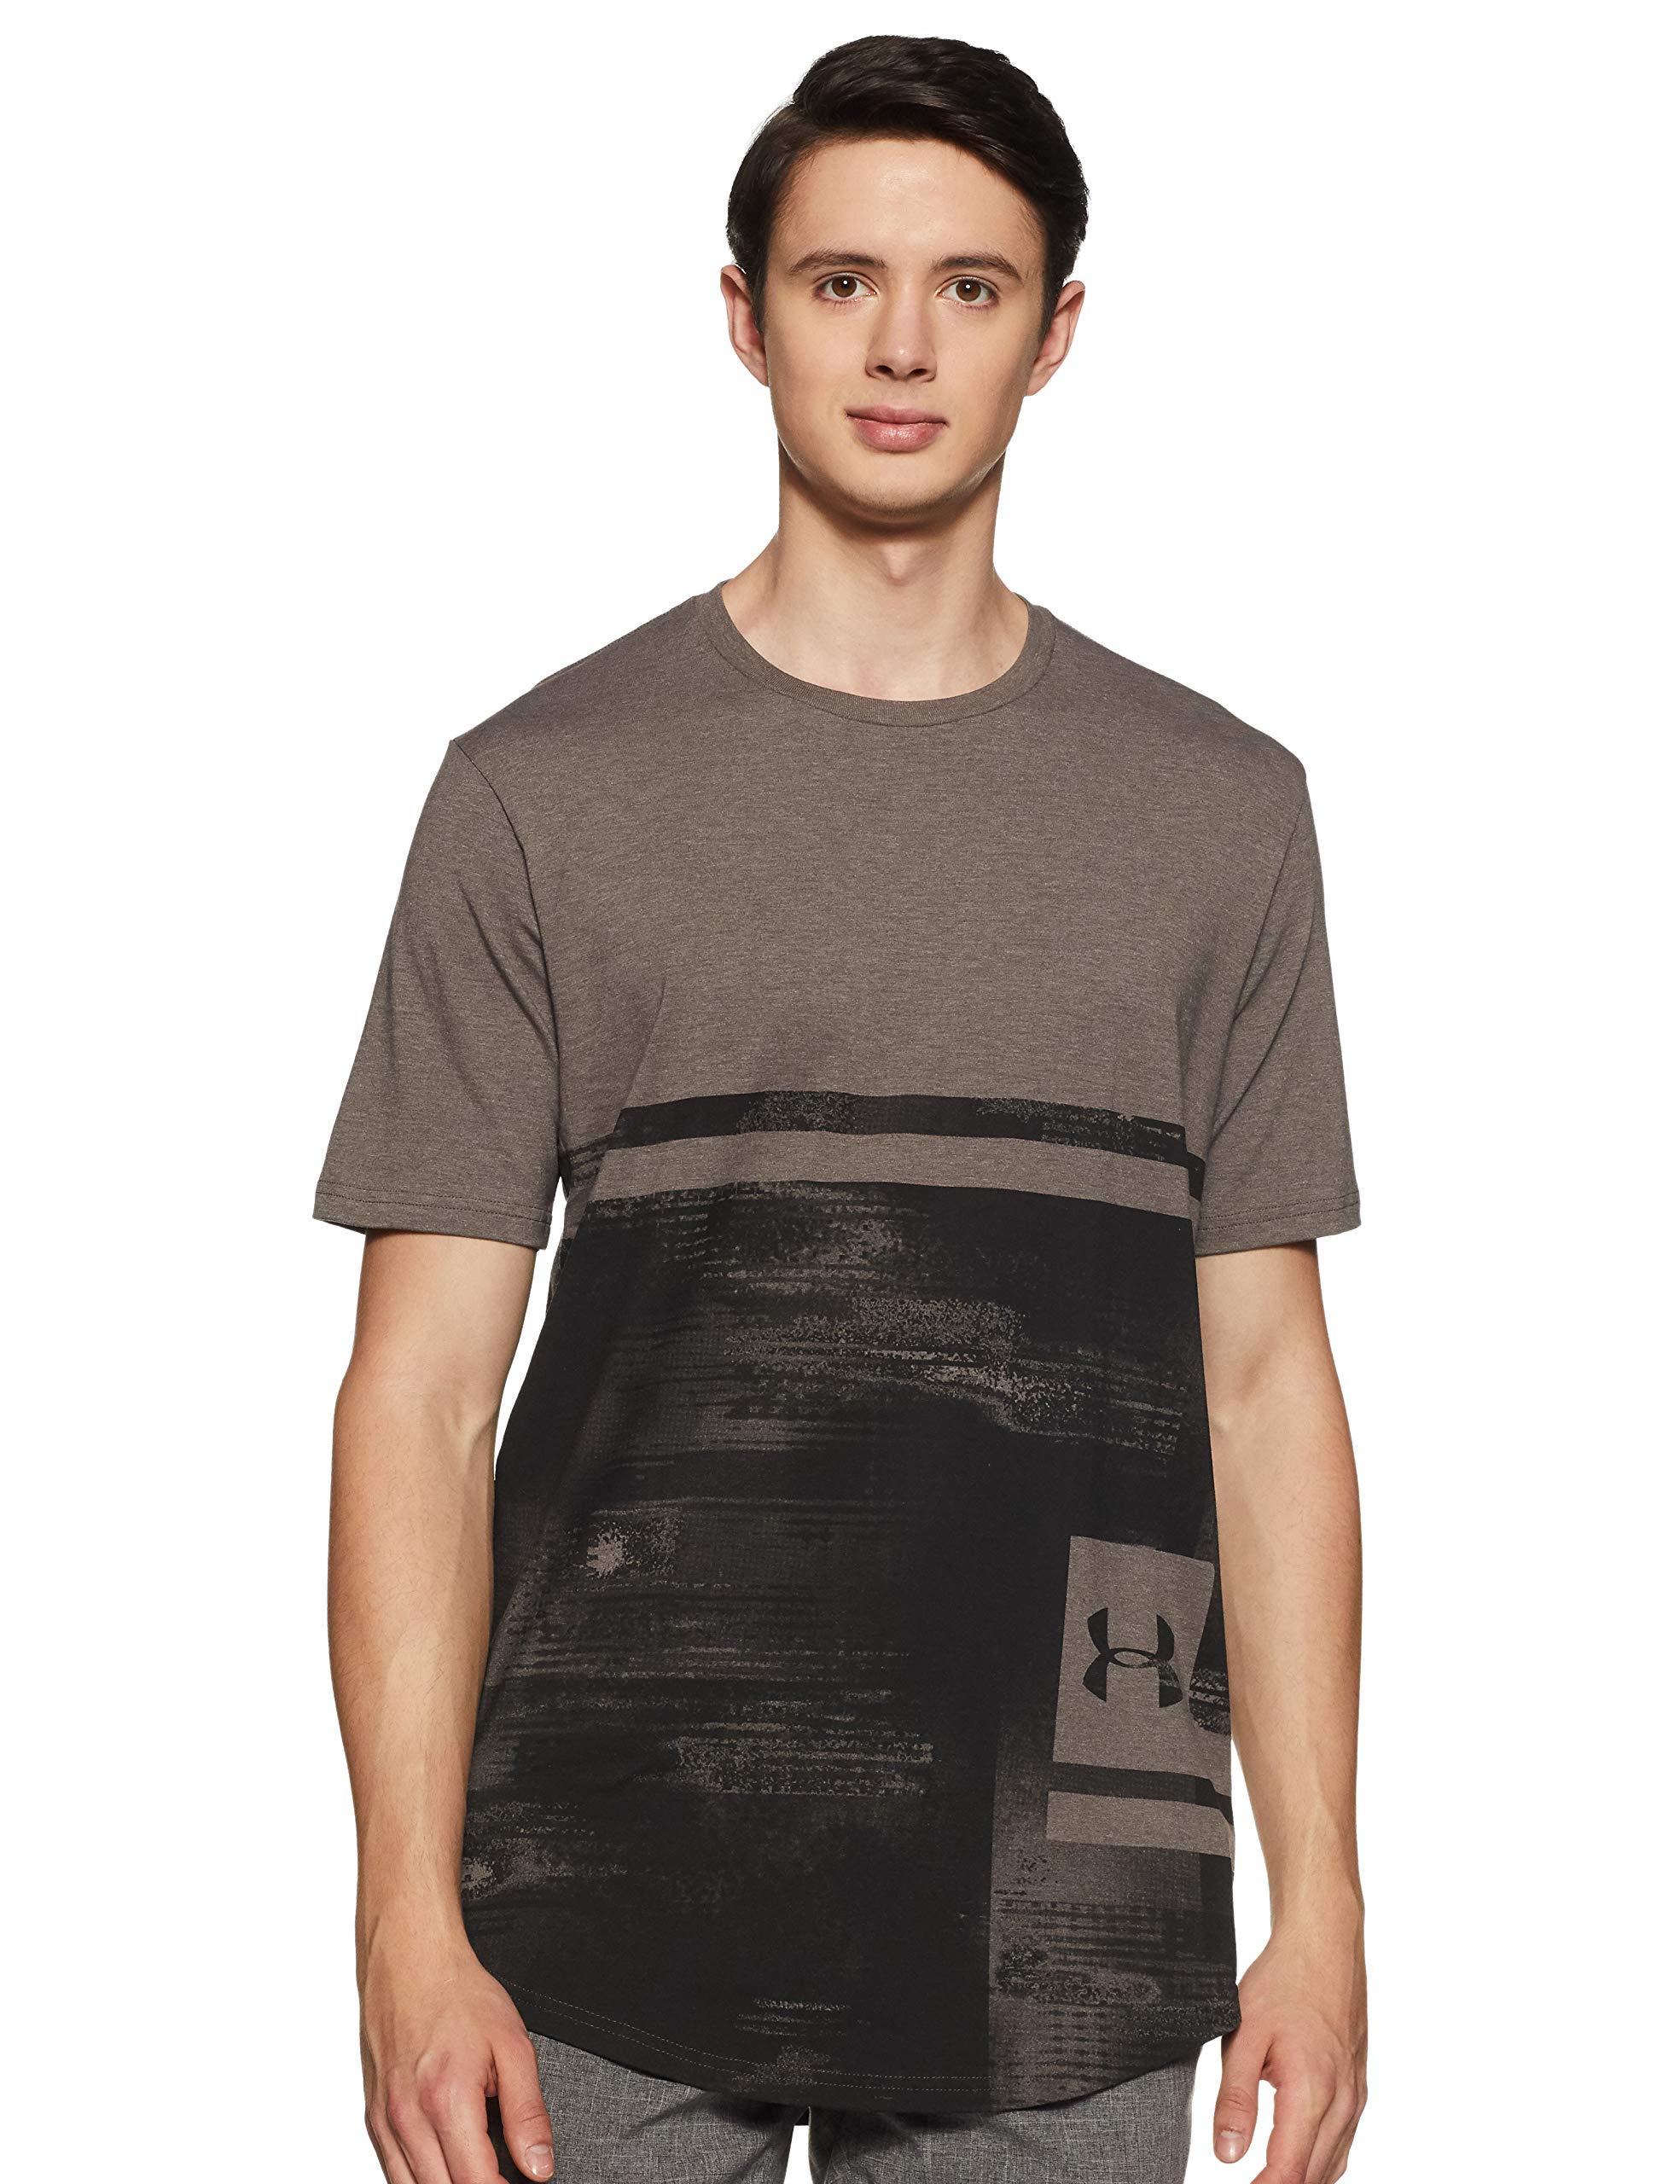 Under Armour Men's UA Sportstyle Print Short Sleeve Shirt XL Fresh Clay Medium Heather